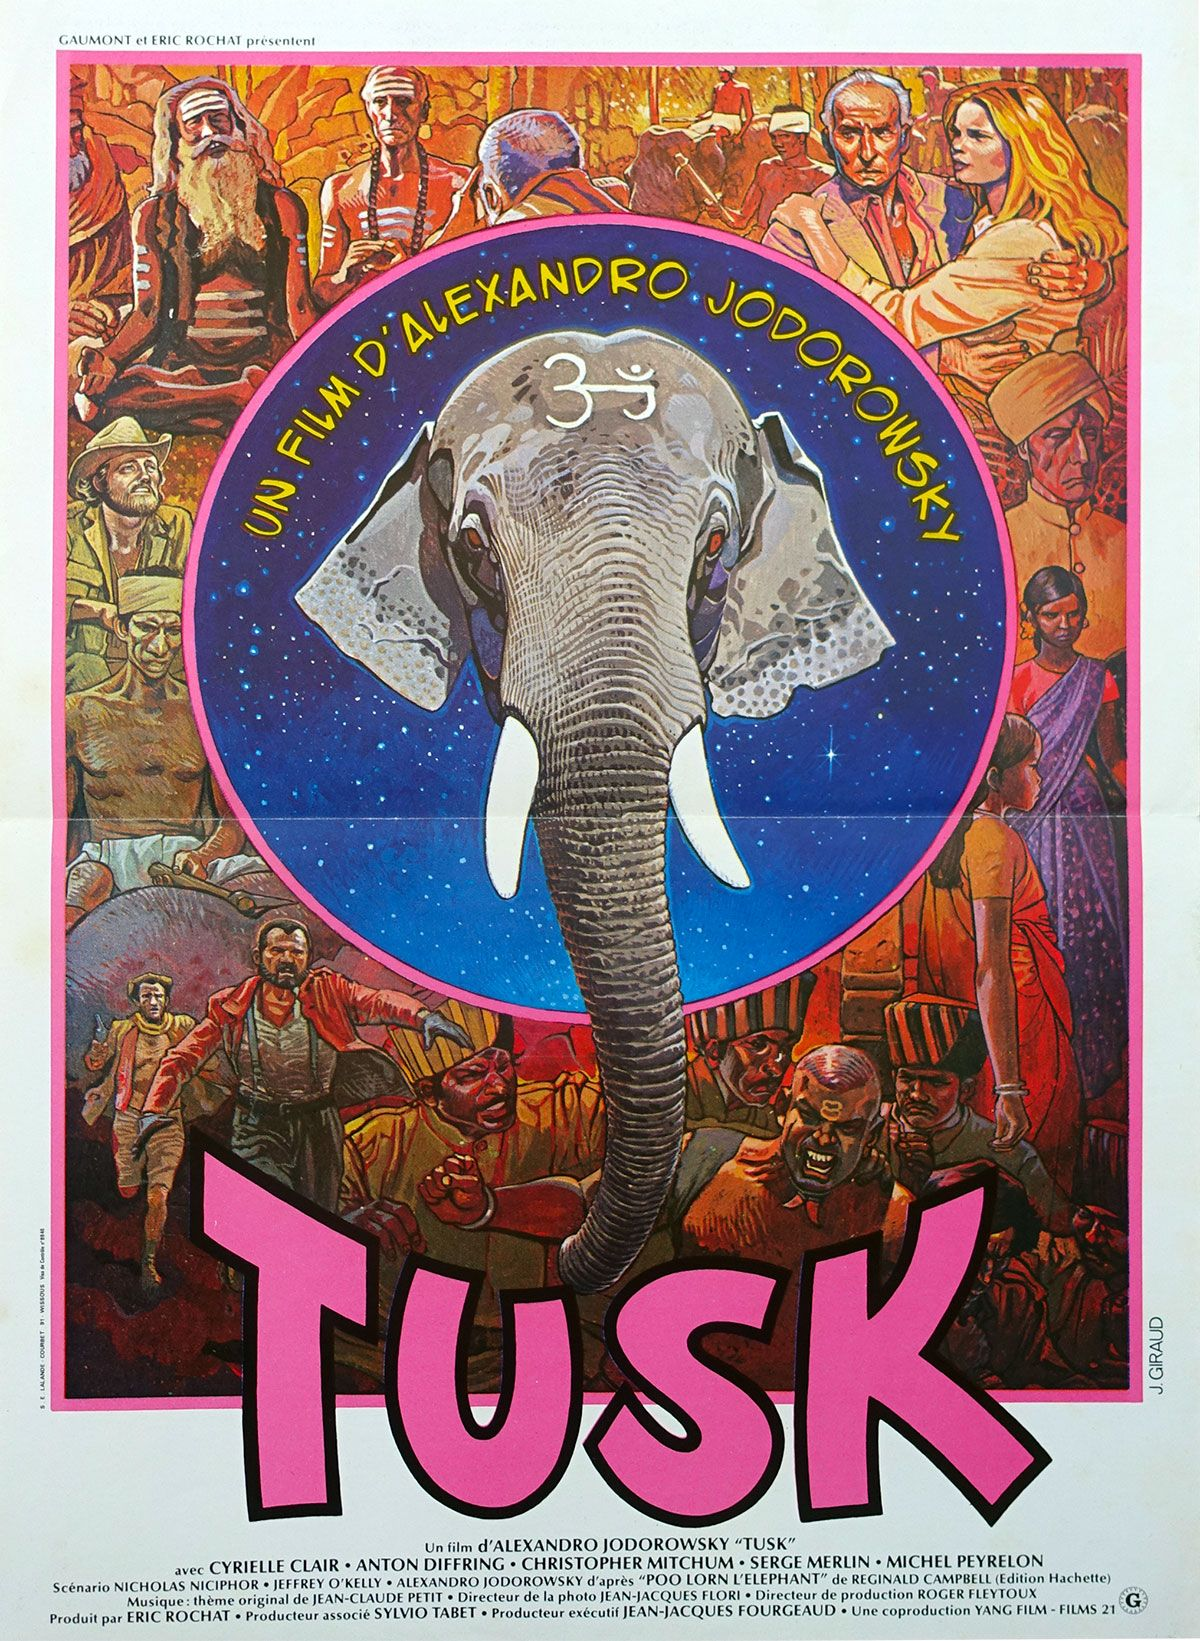 tusk-affiche-de-film-40x60-cm-1980-cyrielle-clair-alejandro-jodorowsky.jpg